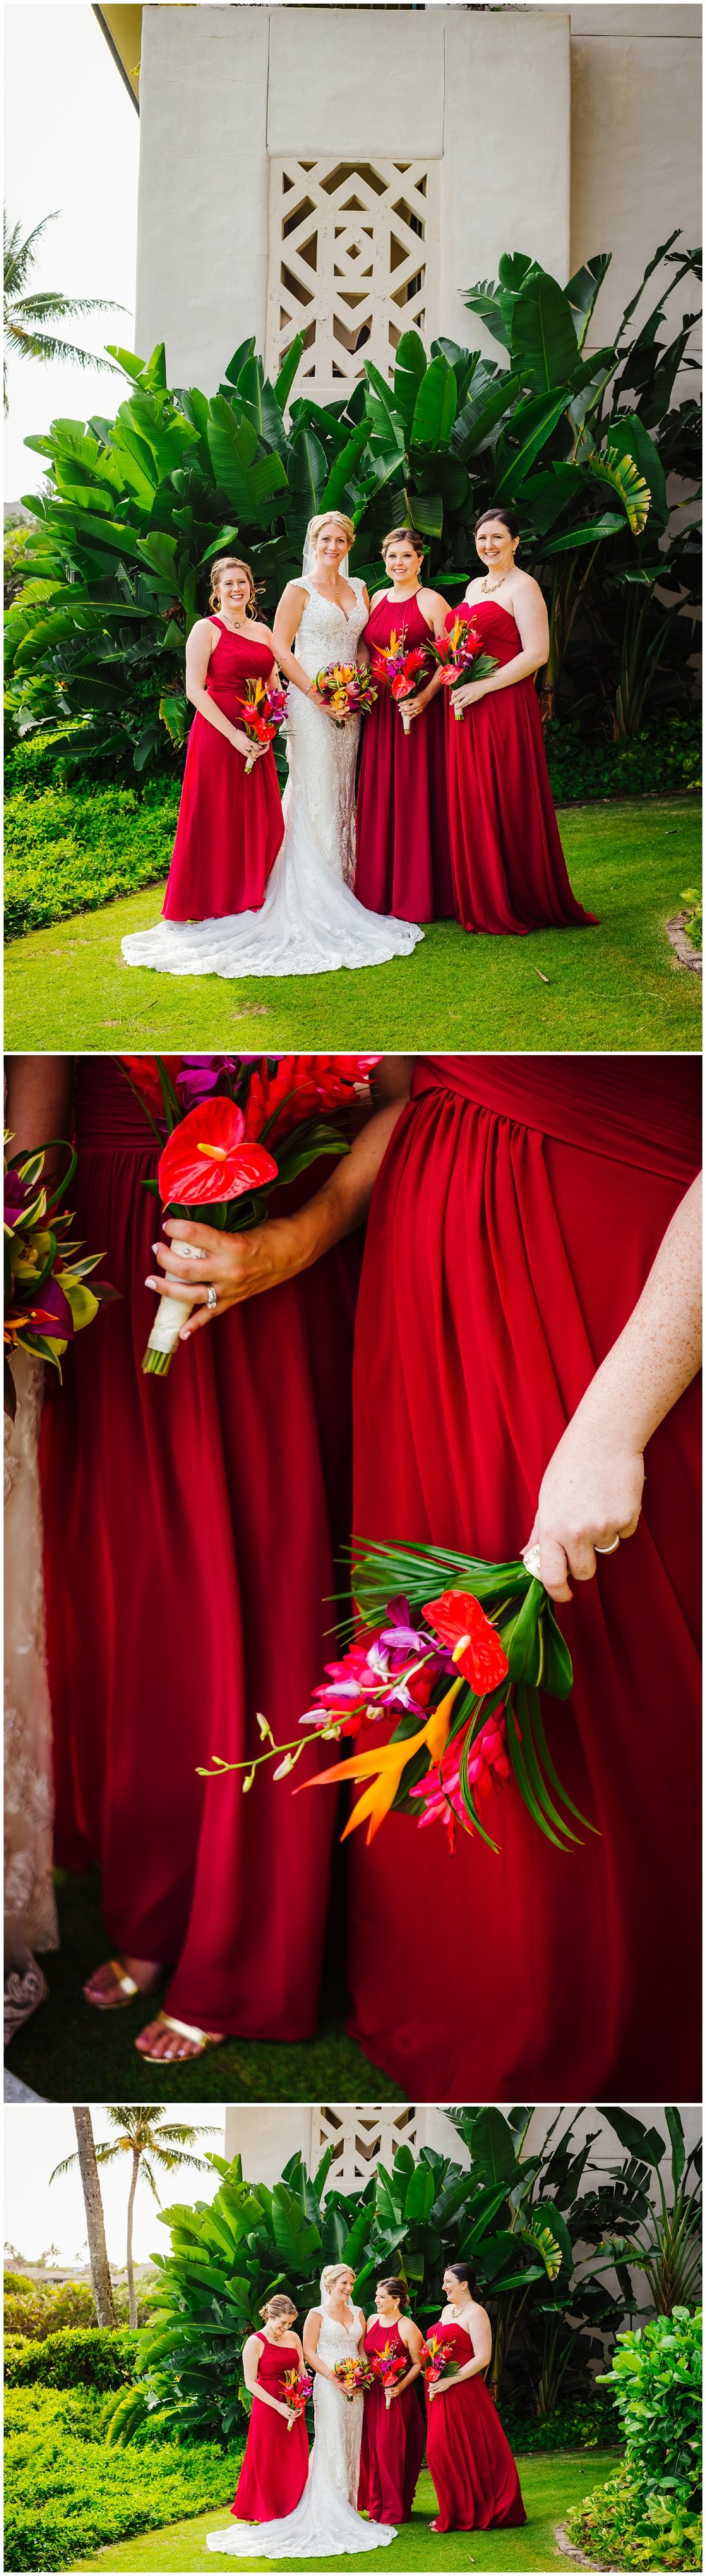 destination-wedding-hawaii-kauai-grand-hyatt-resort-napali-coast-sail_0053.jpg